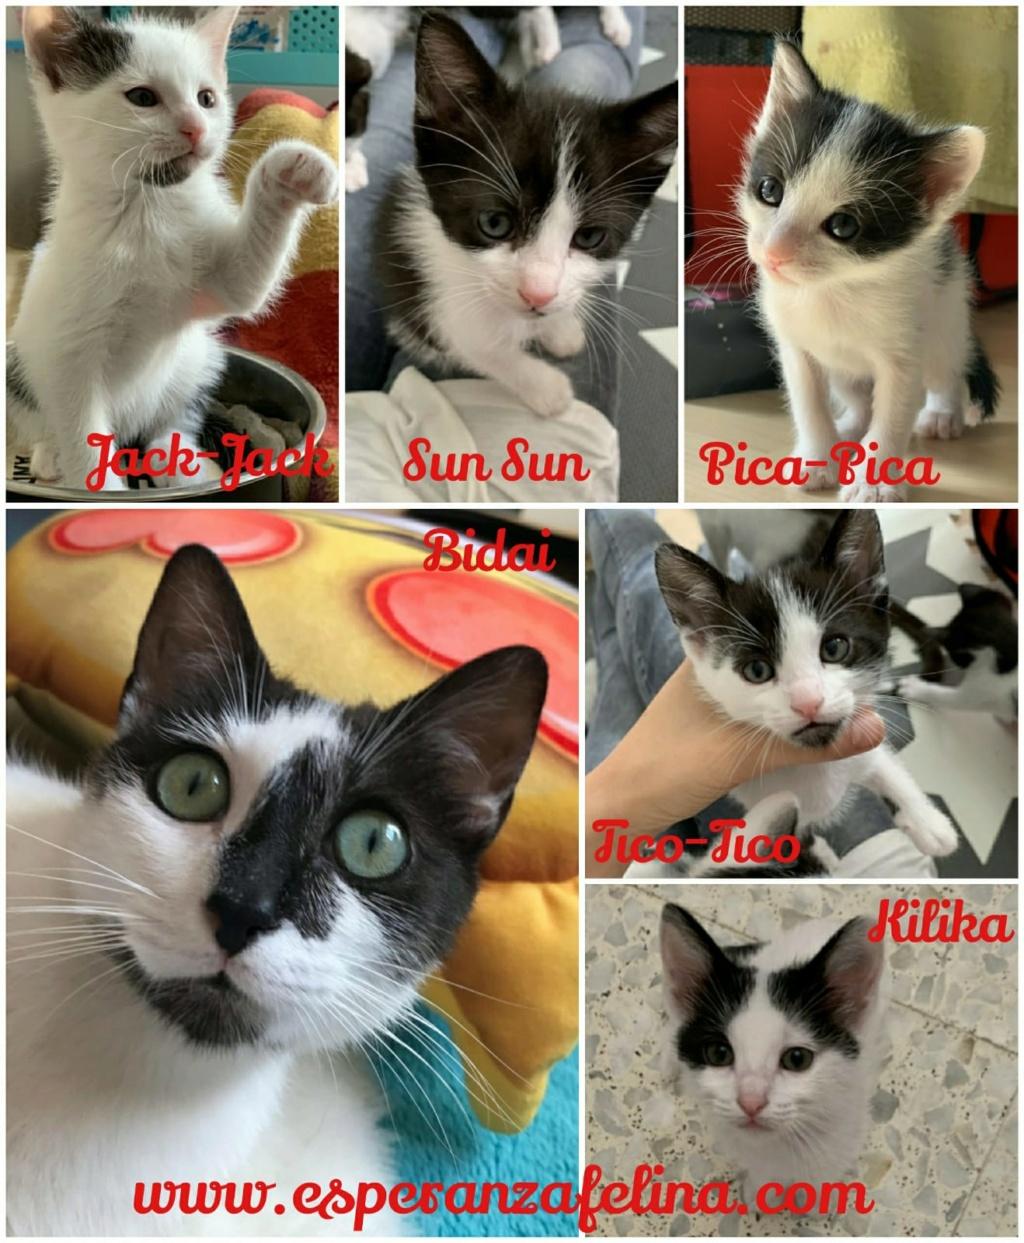 Bidai, Kilika, Tico-Tico, SunSun, Jack-Jack y Pica-Pica. Álava-España (F.N: 08/2018 y 05/2019) Img-2014